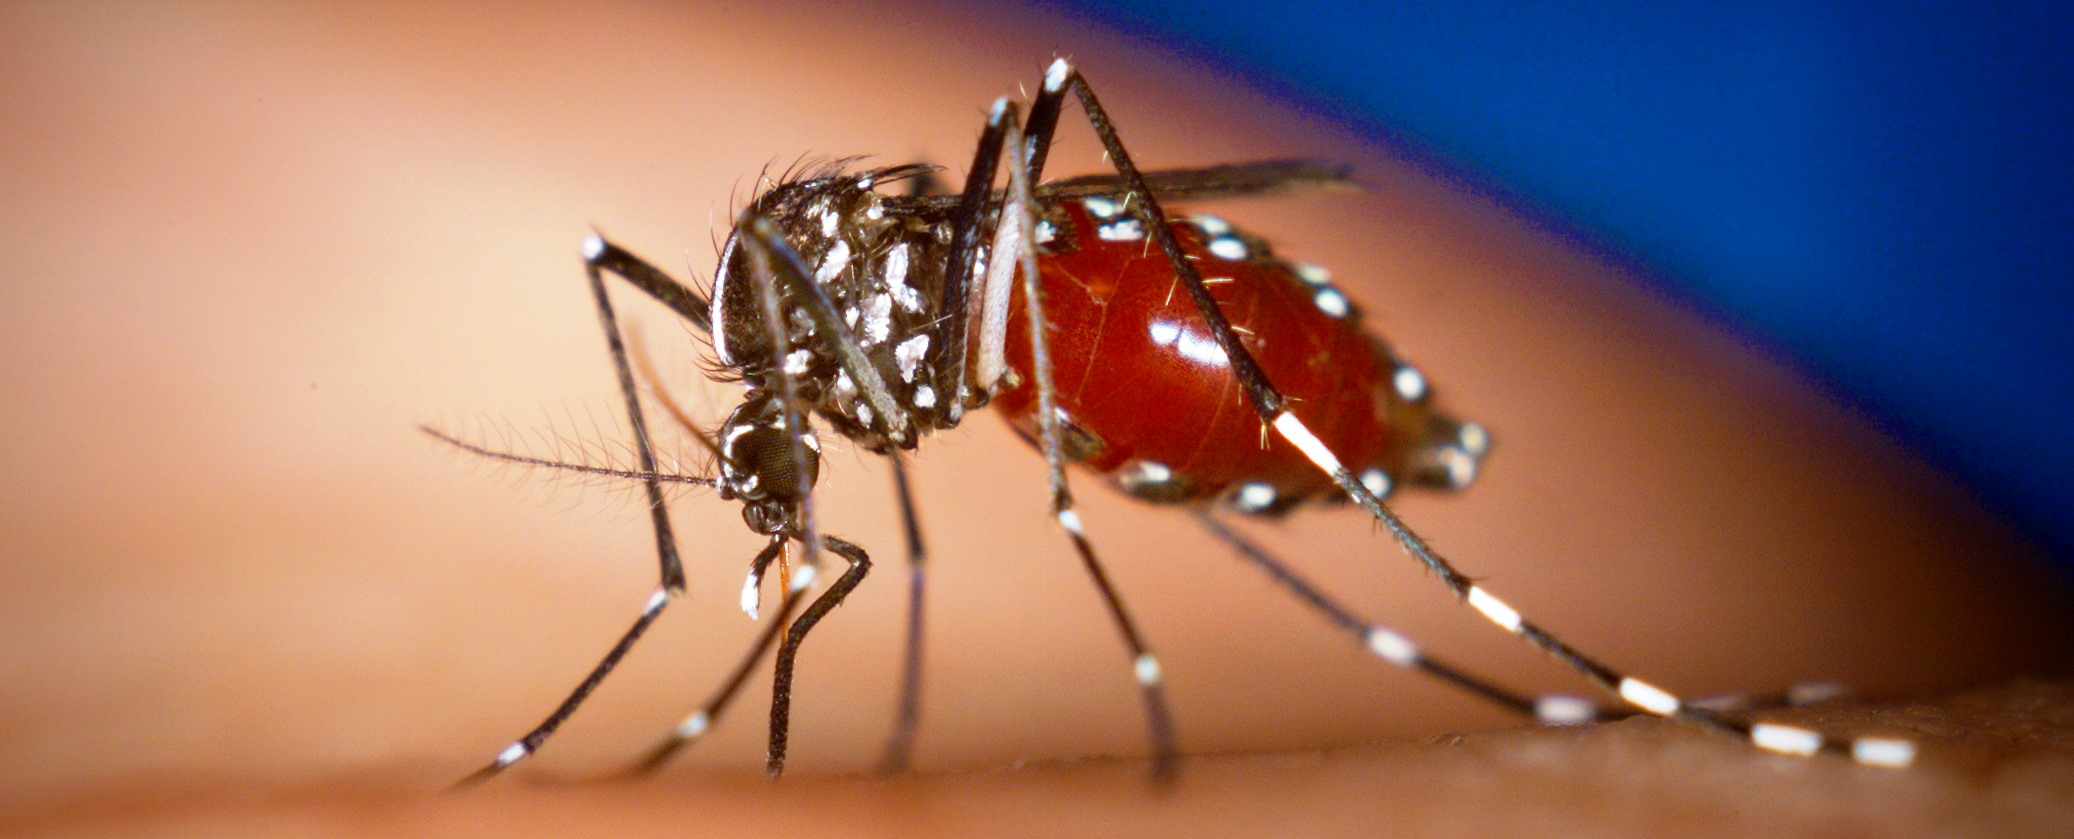 segundo caso importado del virus Chikungunya